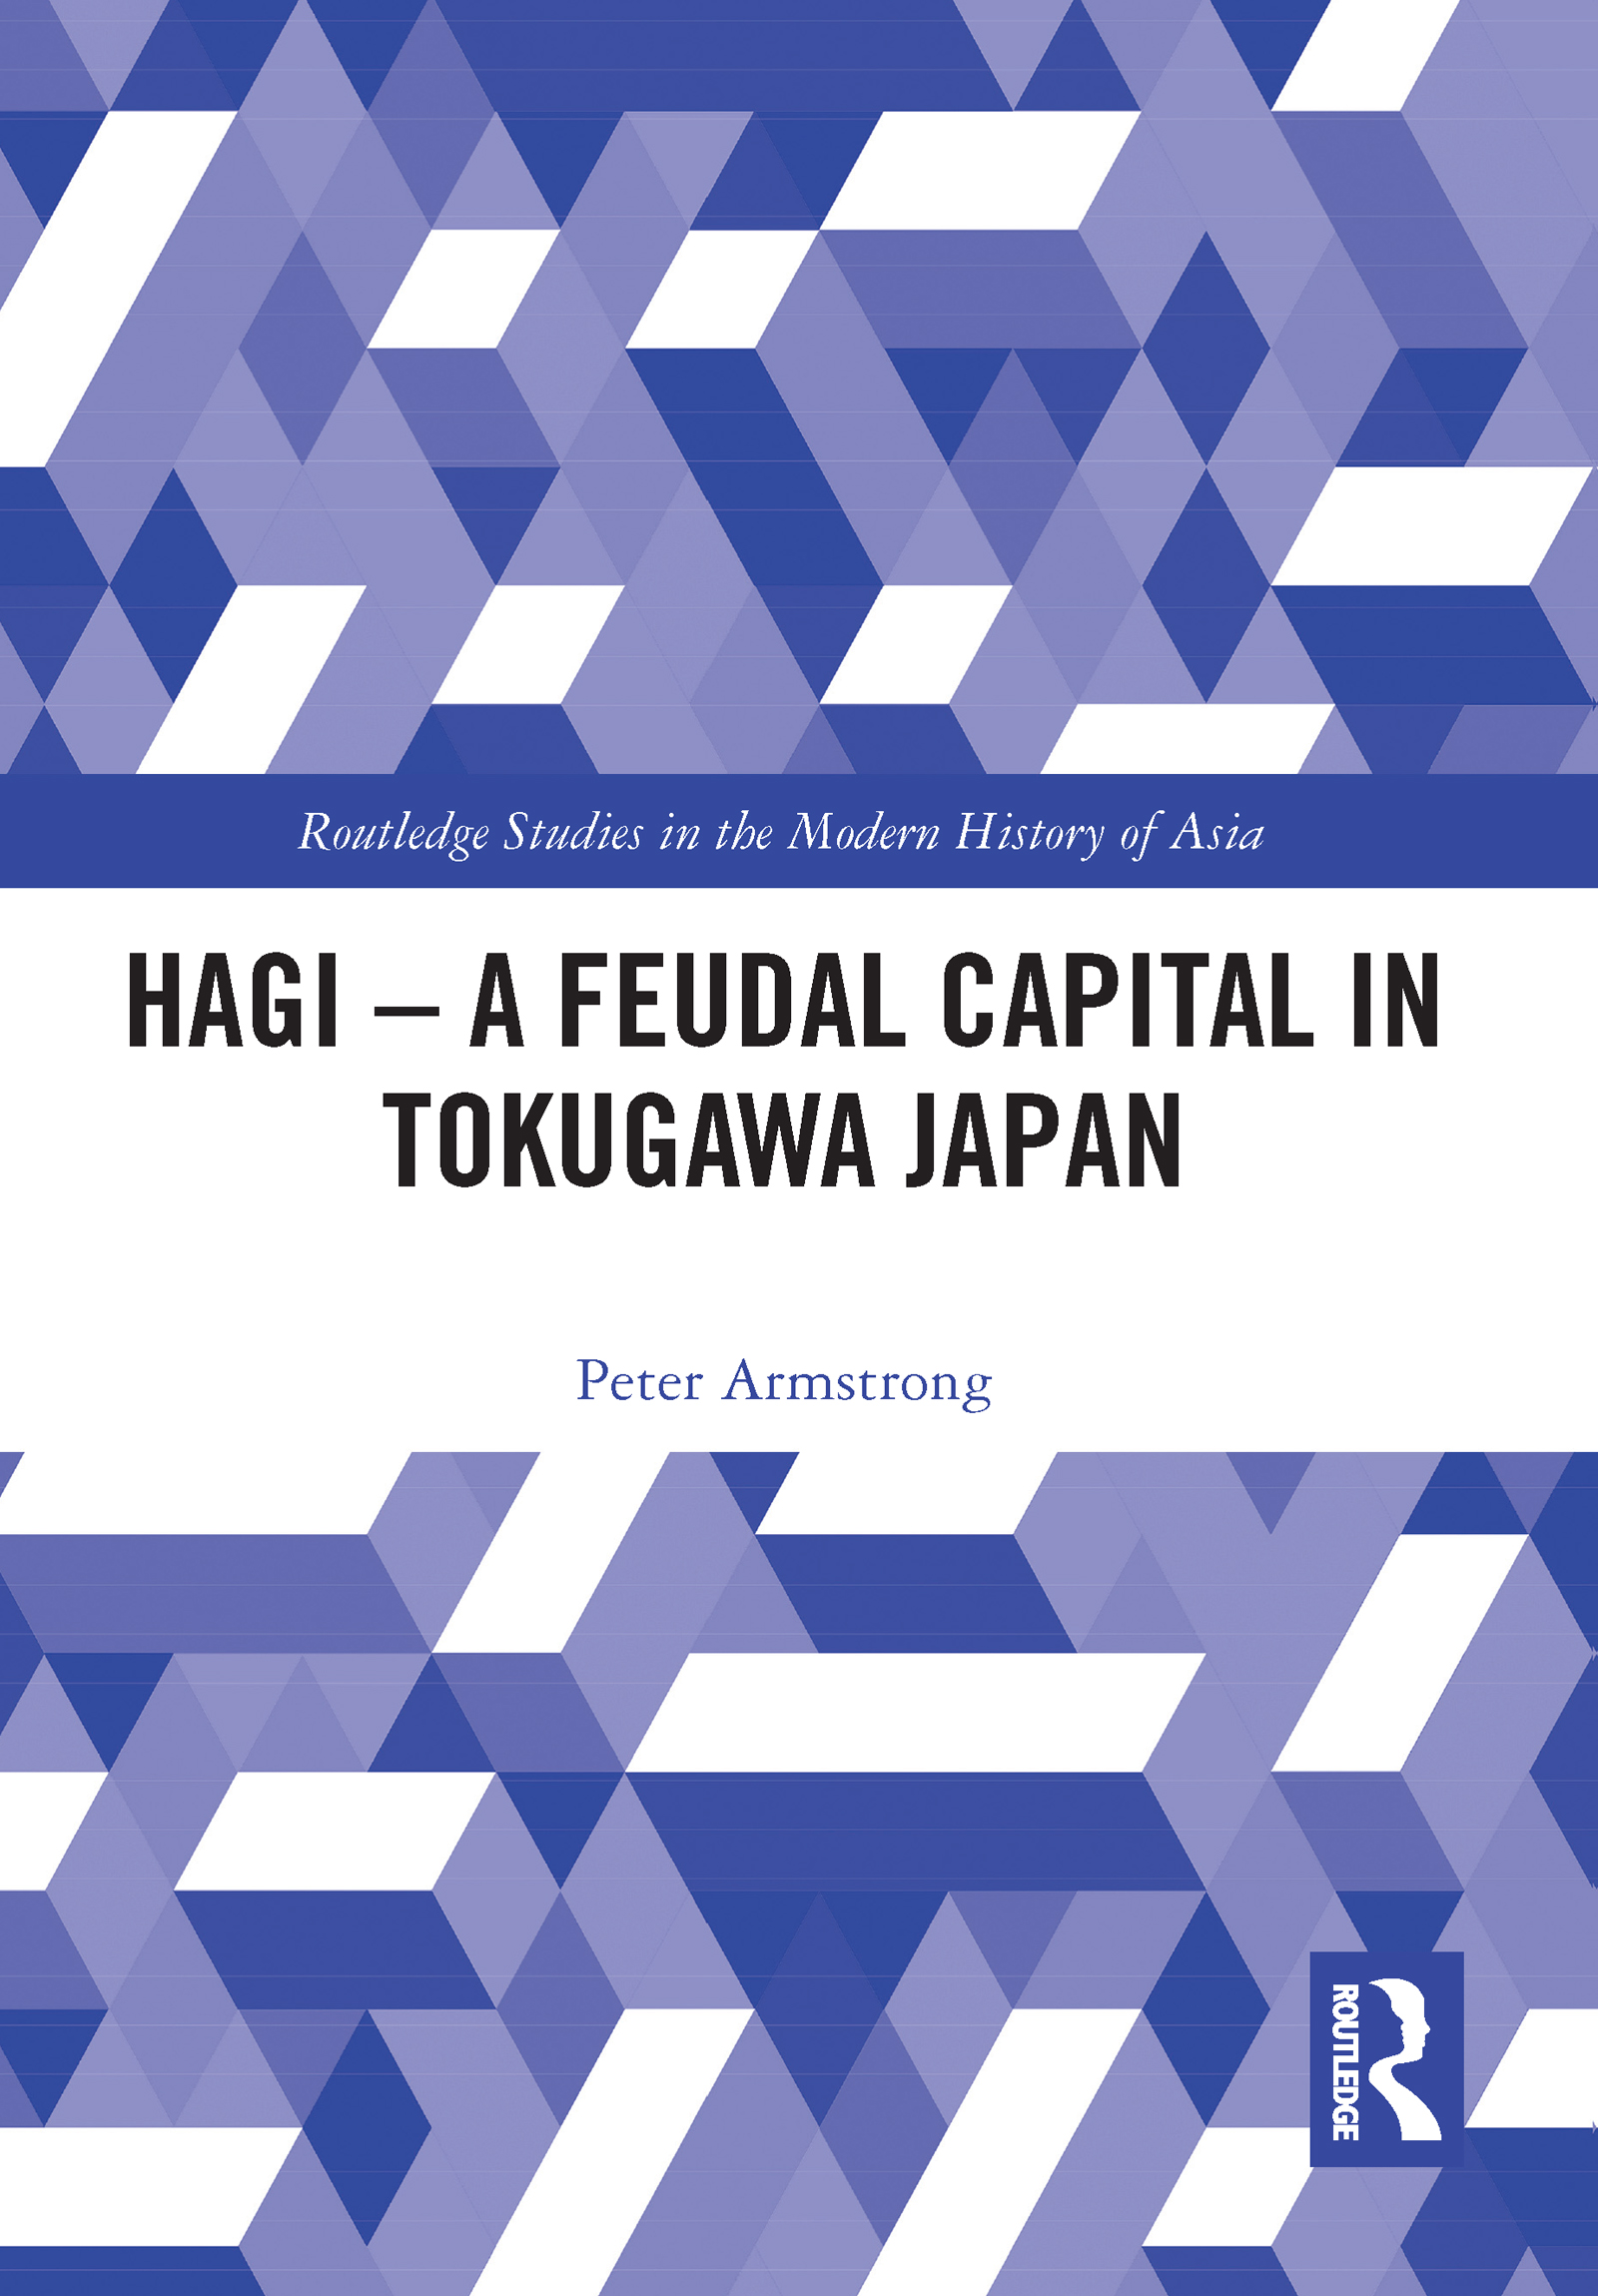 Hagi - A Feudal Capital in Tokugawa Japan